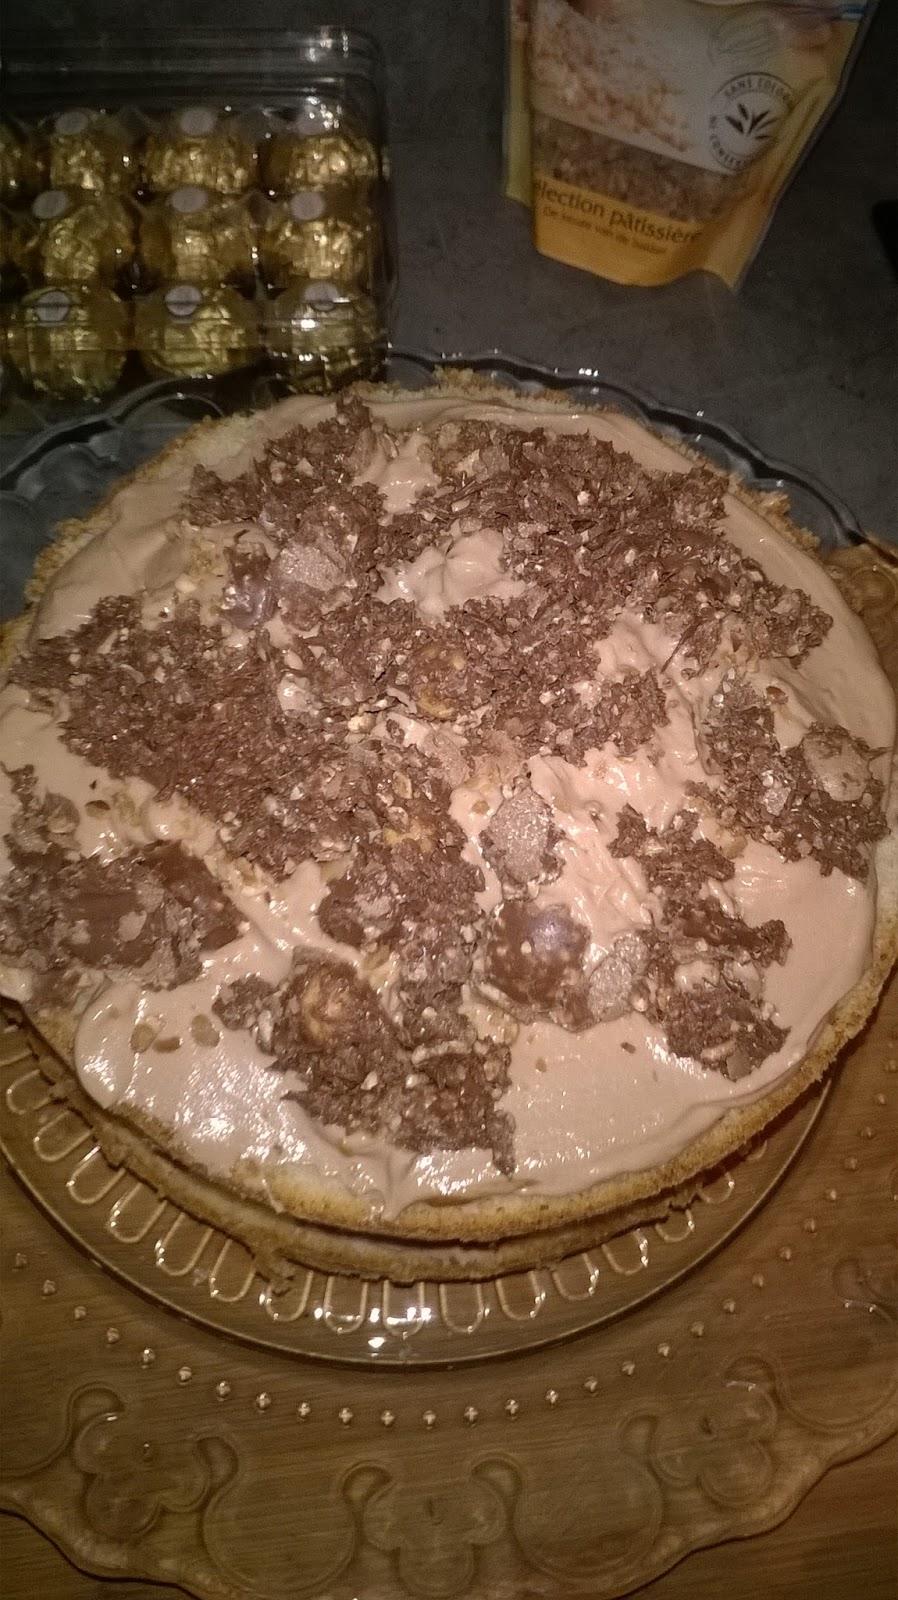 Les gourmandises de roussi layer cake au ferrero - Couler une douille ...